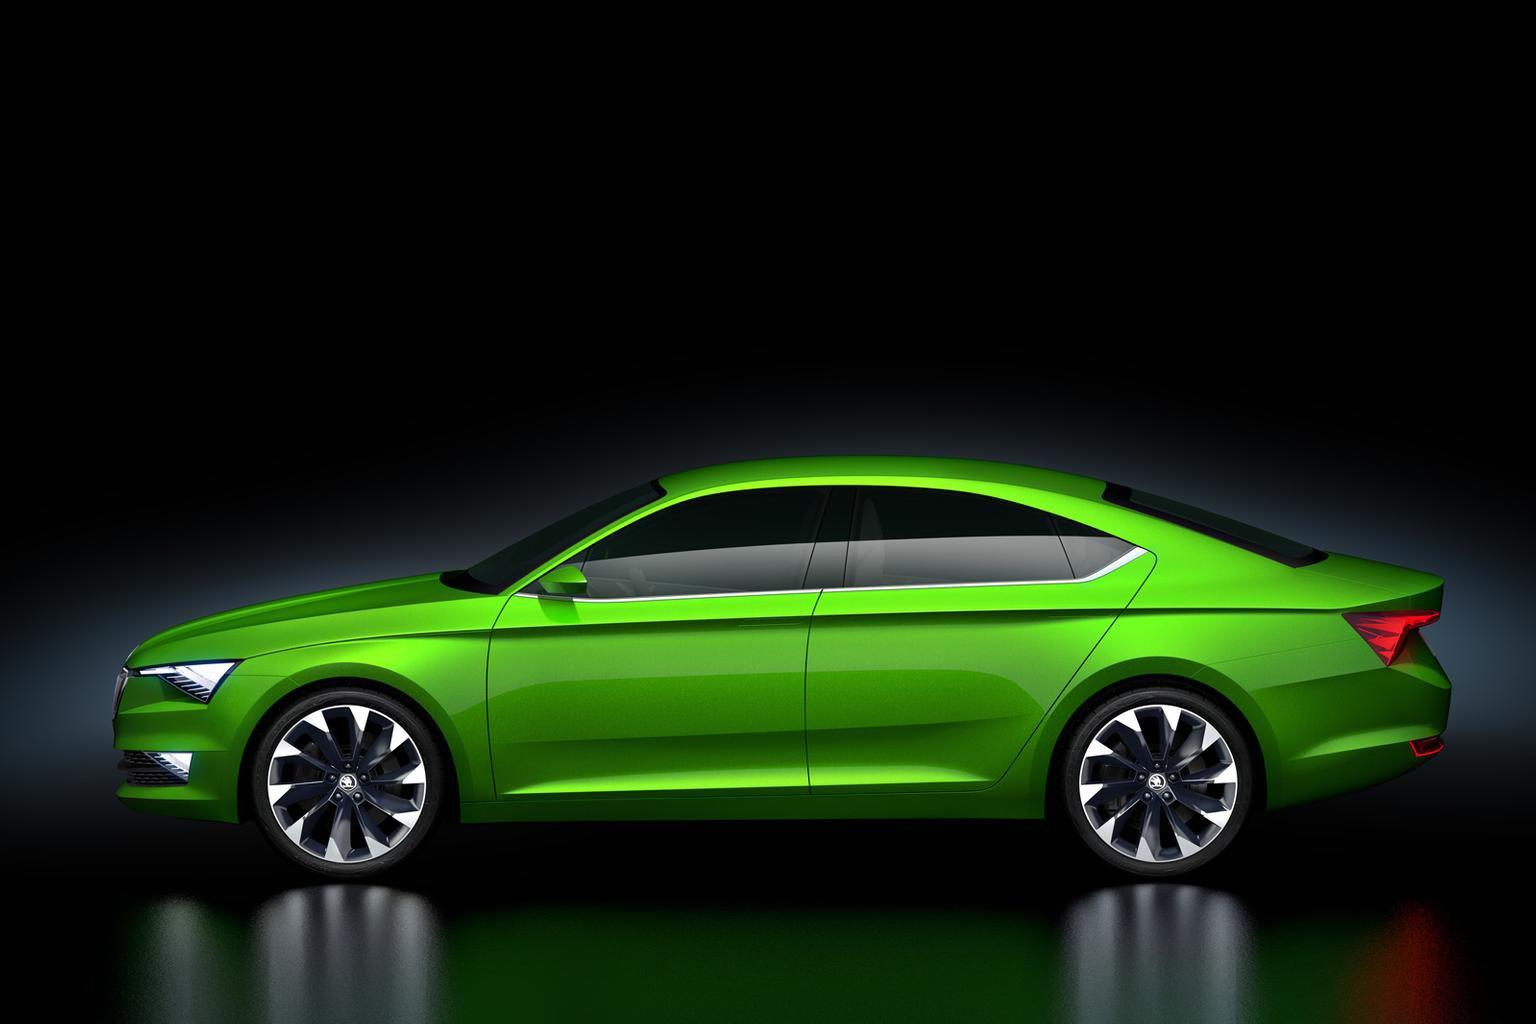 Skoda Vision C signals future styling